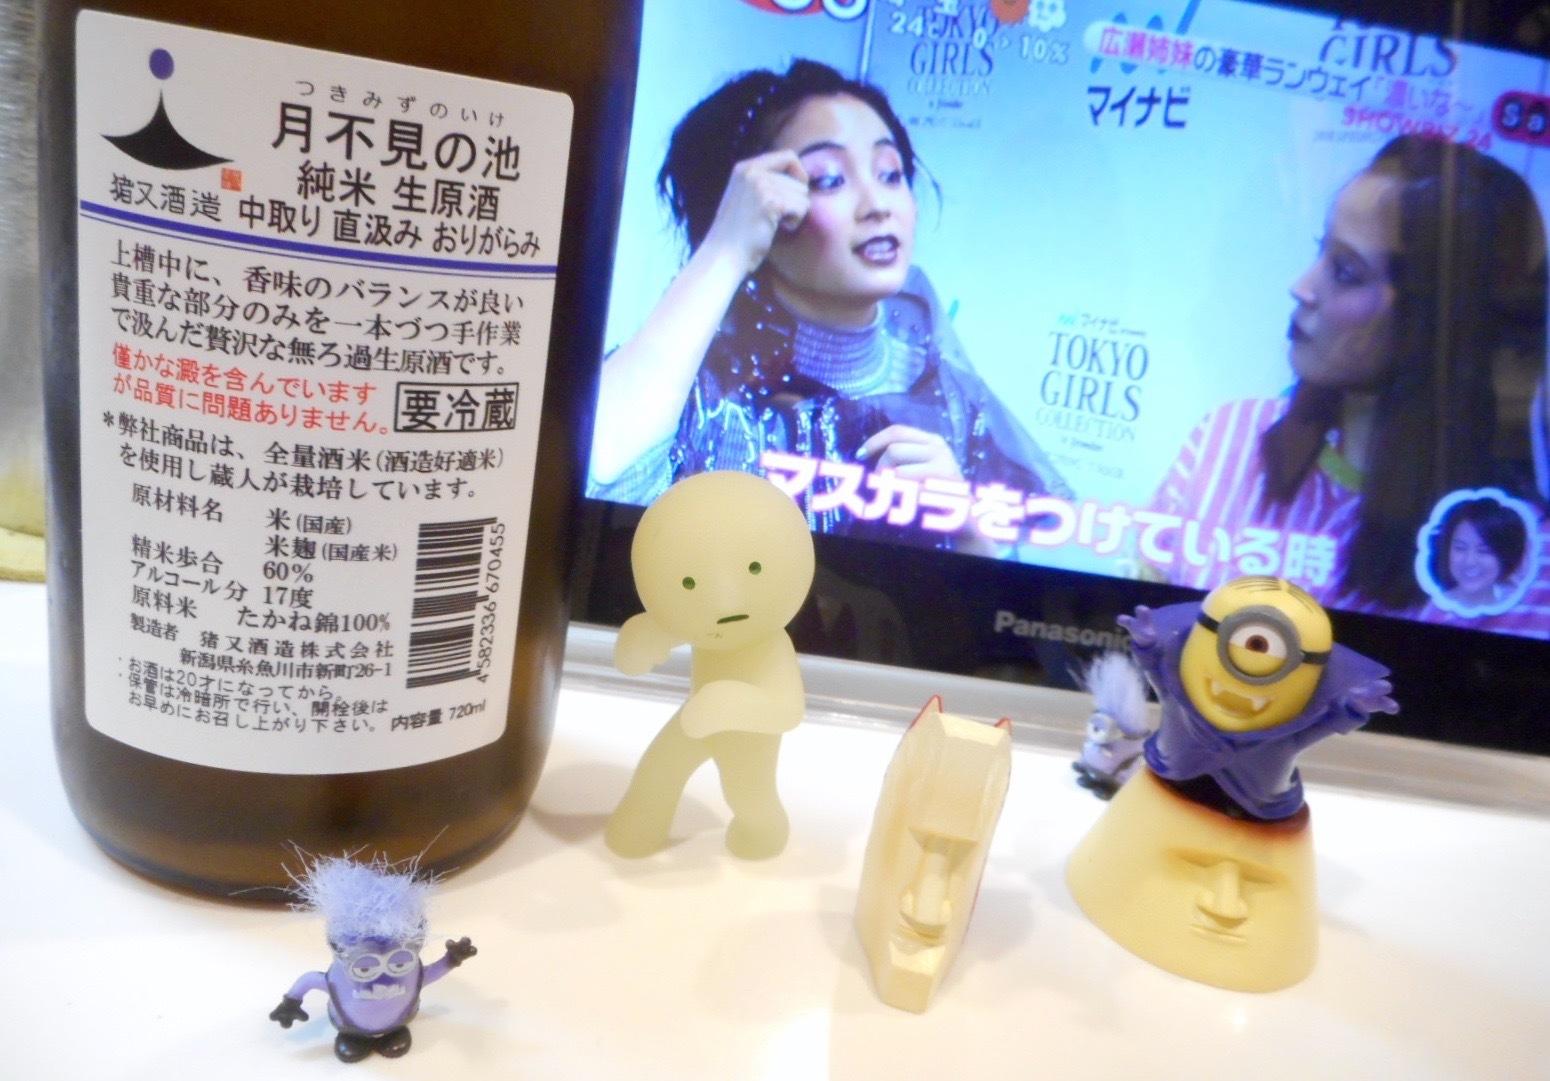 tsukimizunoike_junmai_jikagumi29by2.jpg